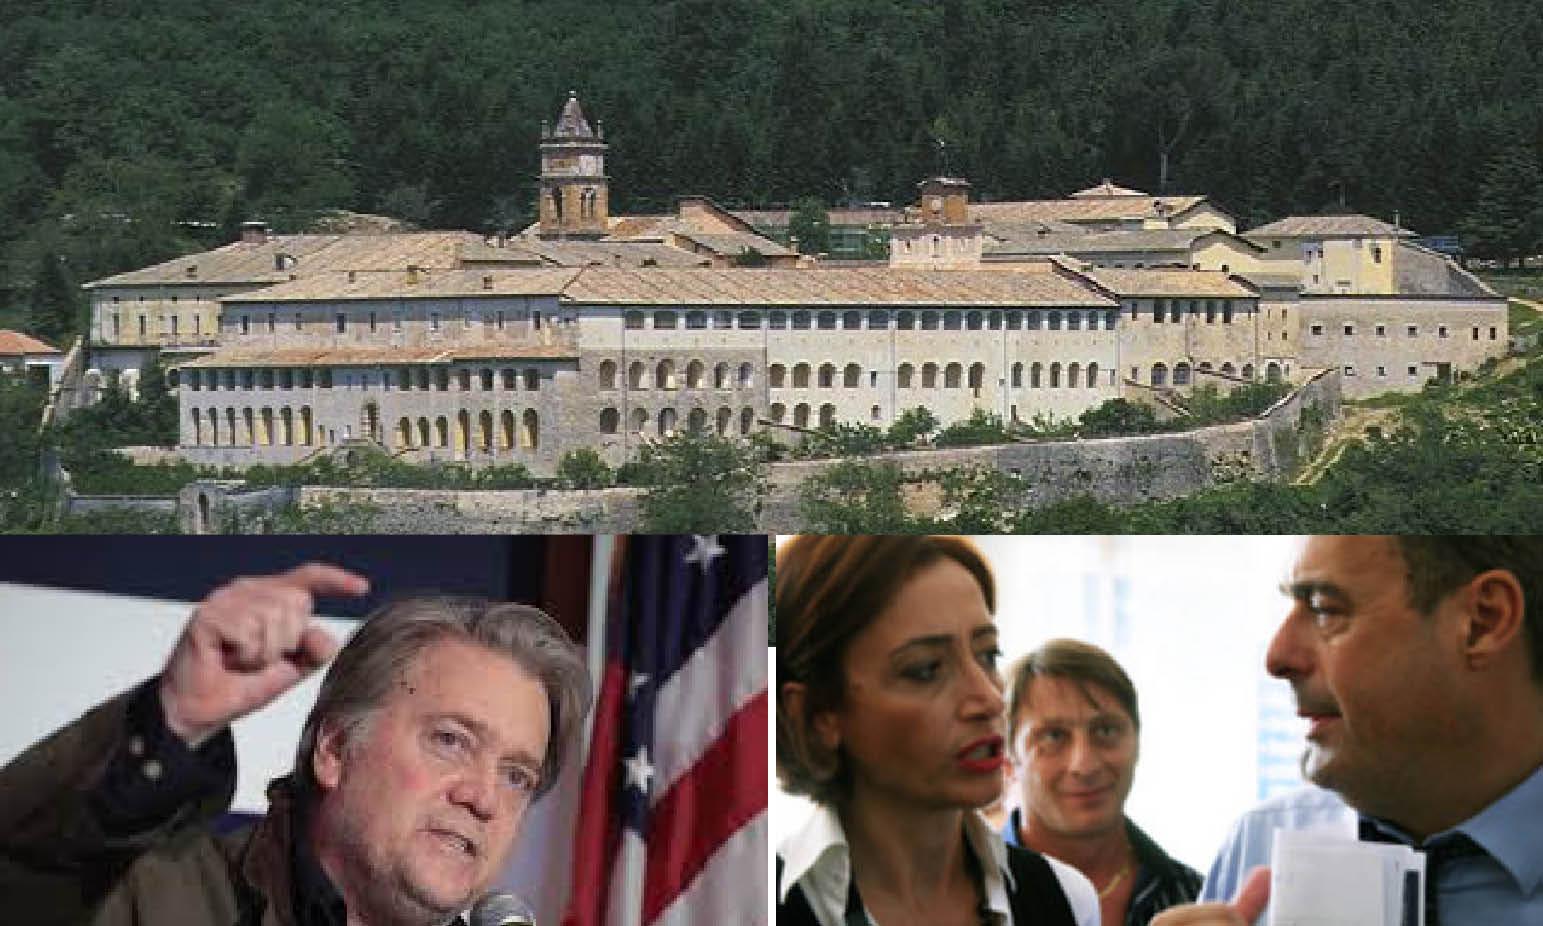 BATTLE FOR ITALIAN MONASTERY: Bannon's sovereign Christian gladiators against LGBT globalist cattoKomunists